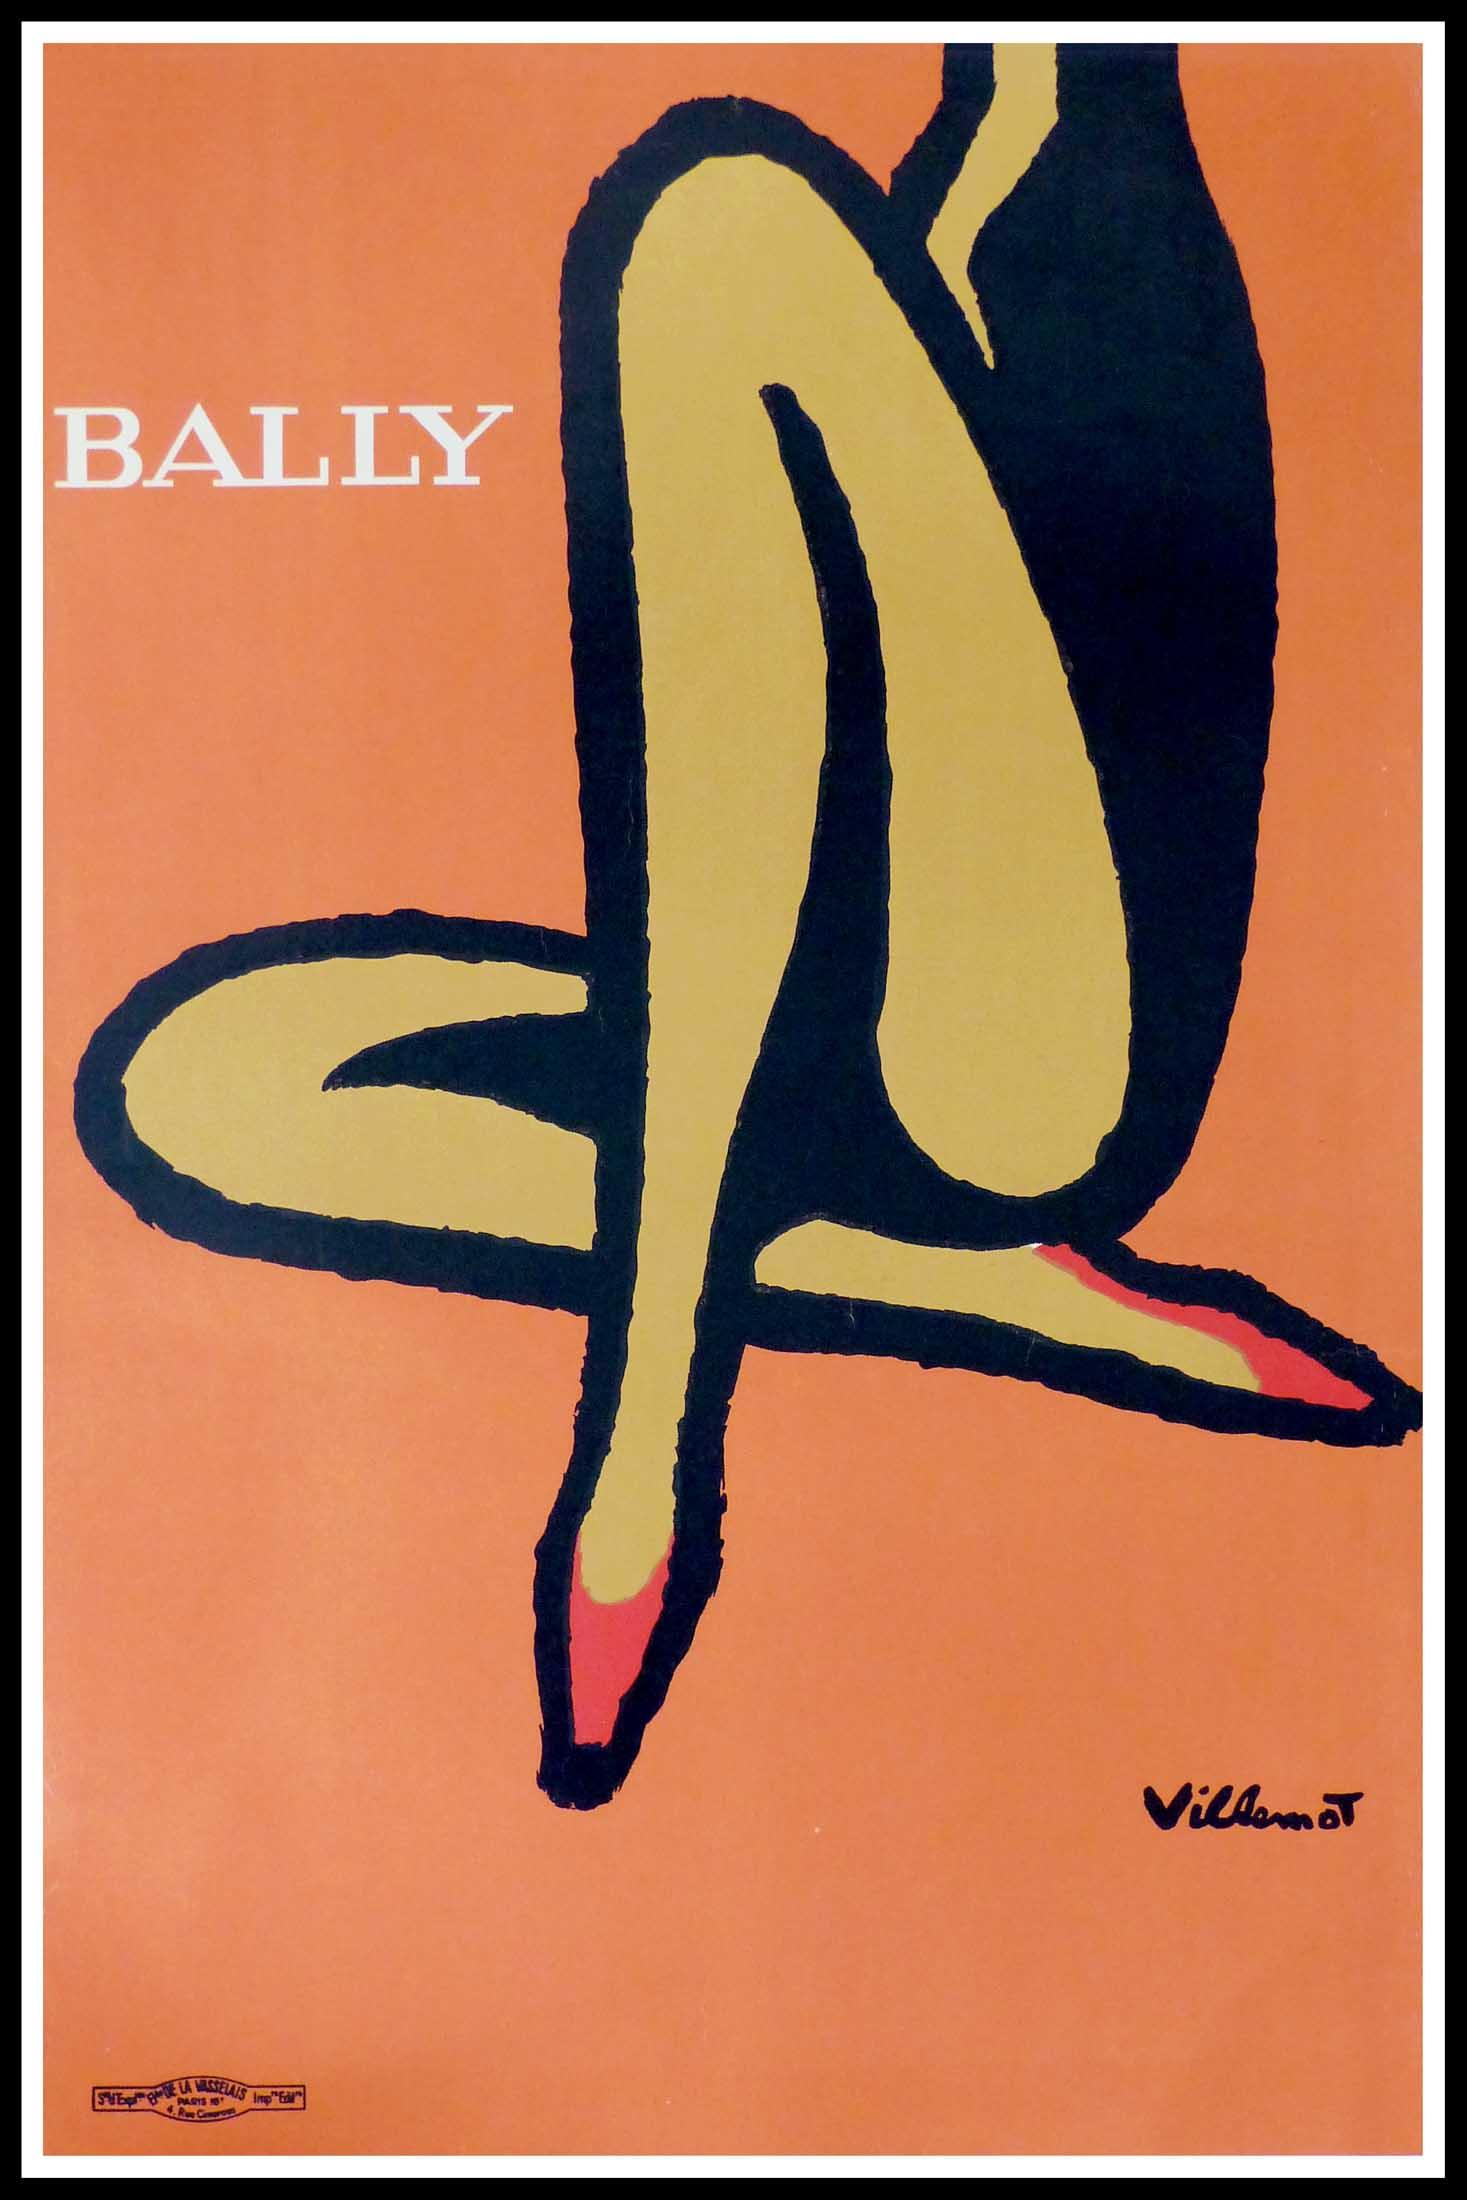 "(alt=""affiche ancienne originale Bernard VILLEMOT Bally Lotus 1967"")"